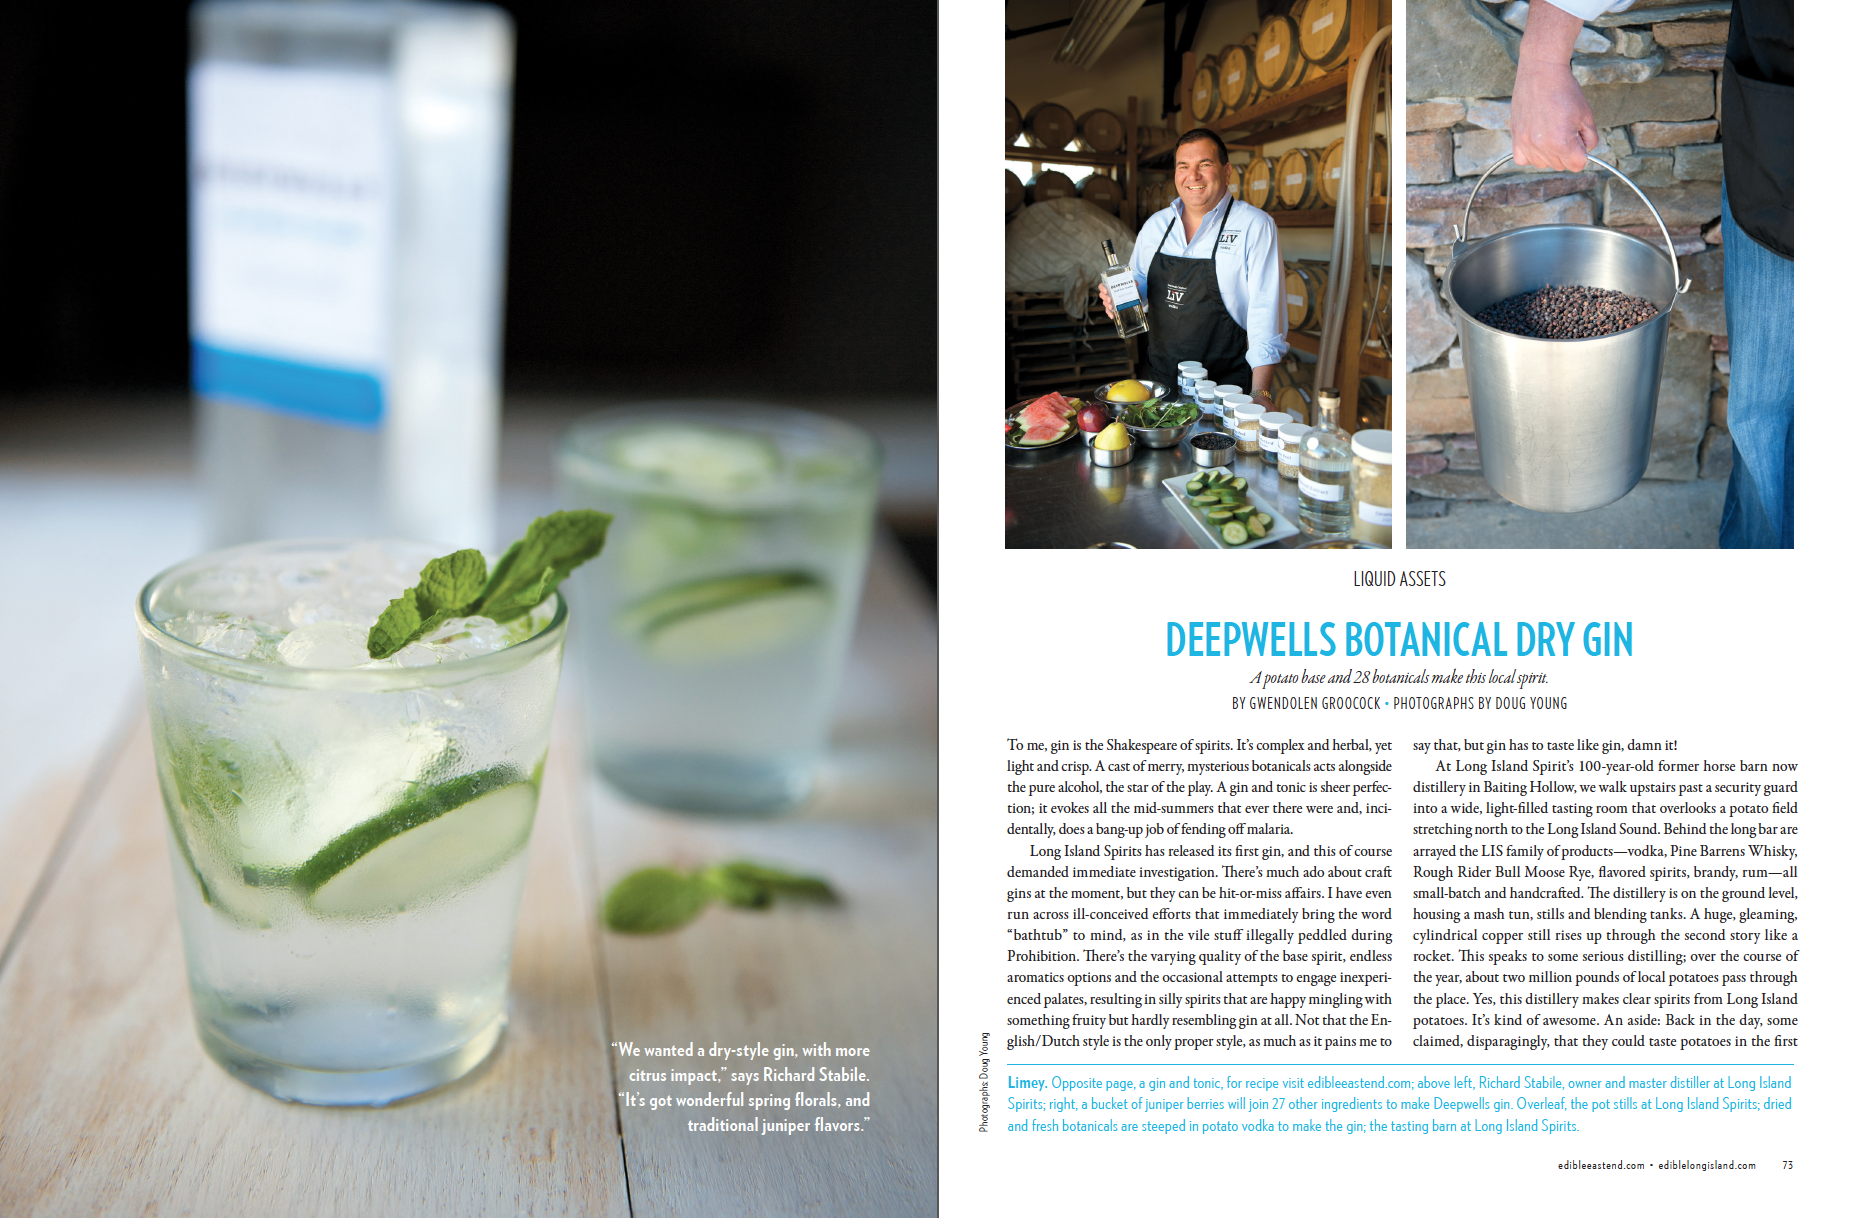 Deepwells Botanical Dry Gin (1 of 3)